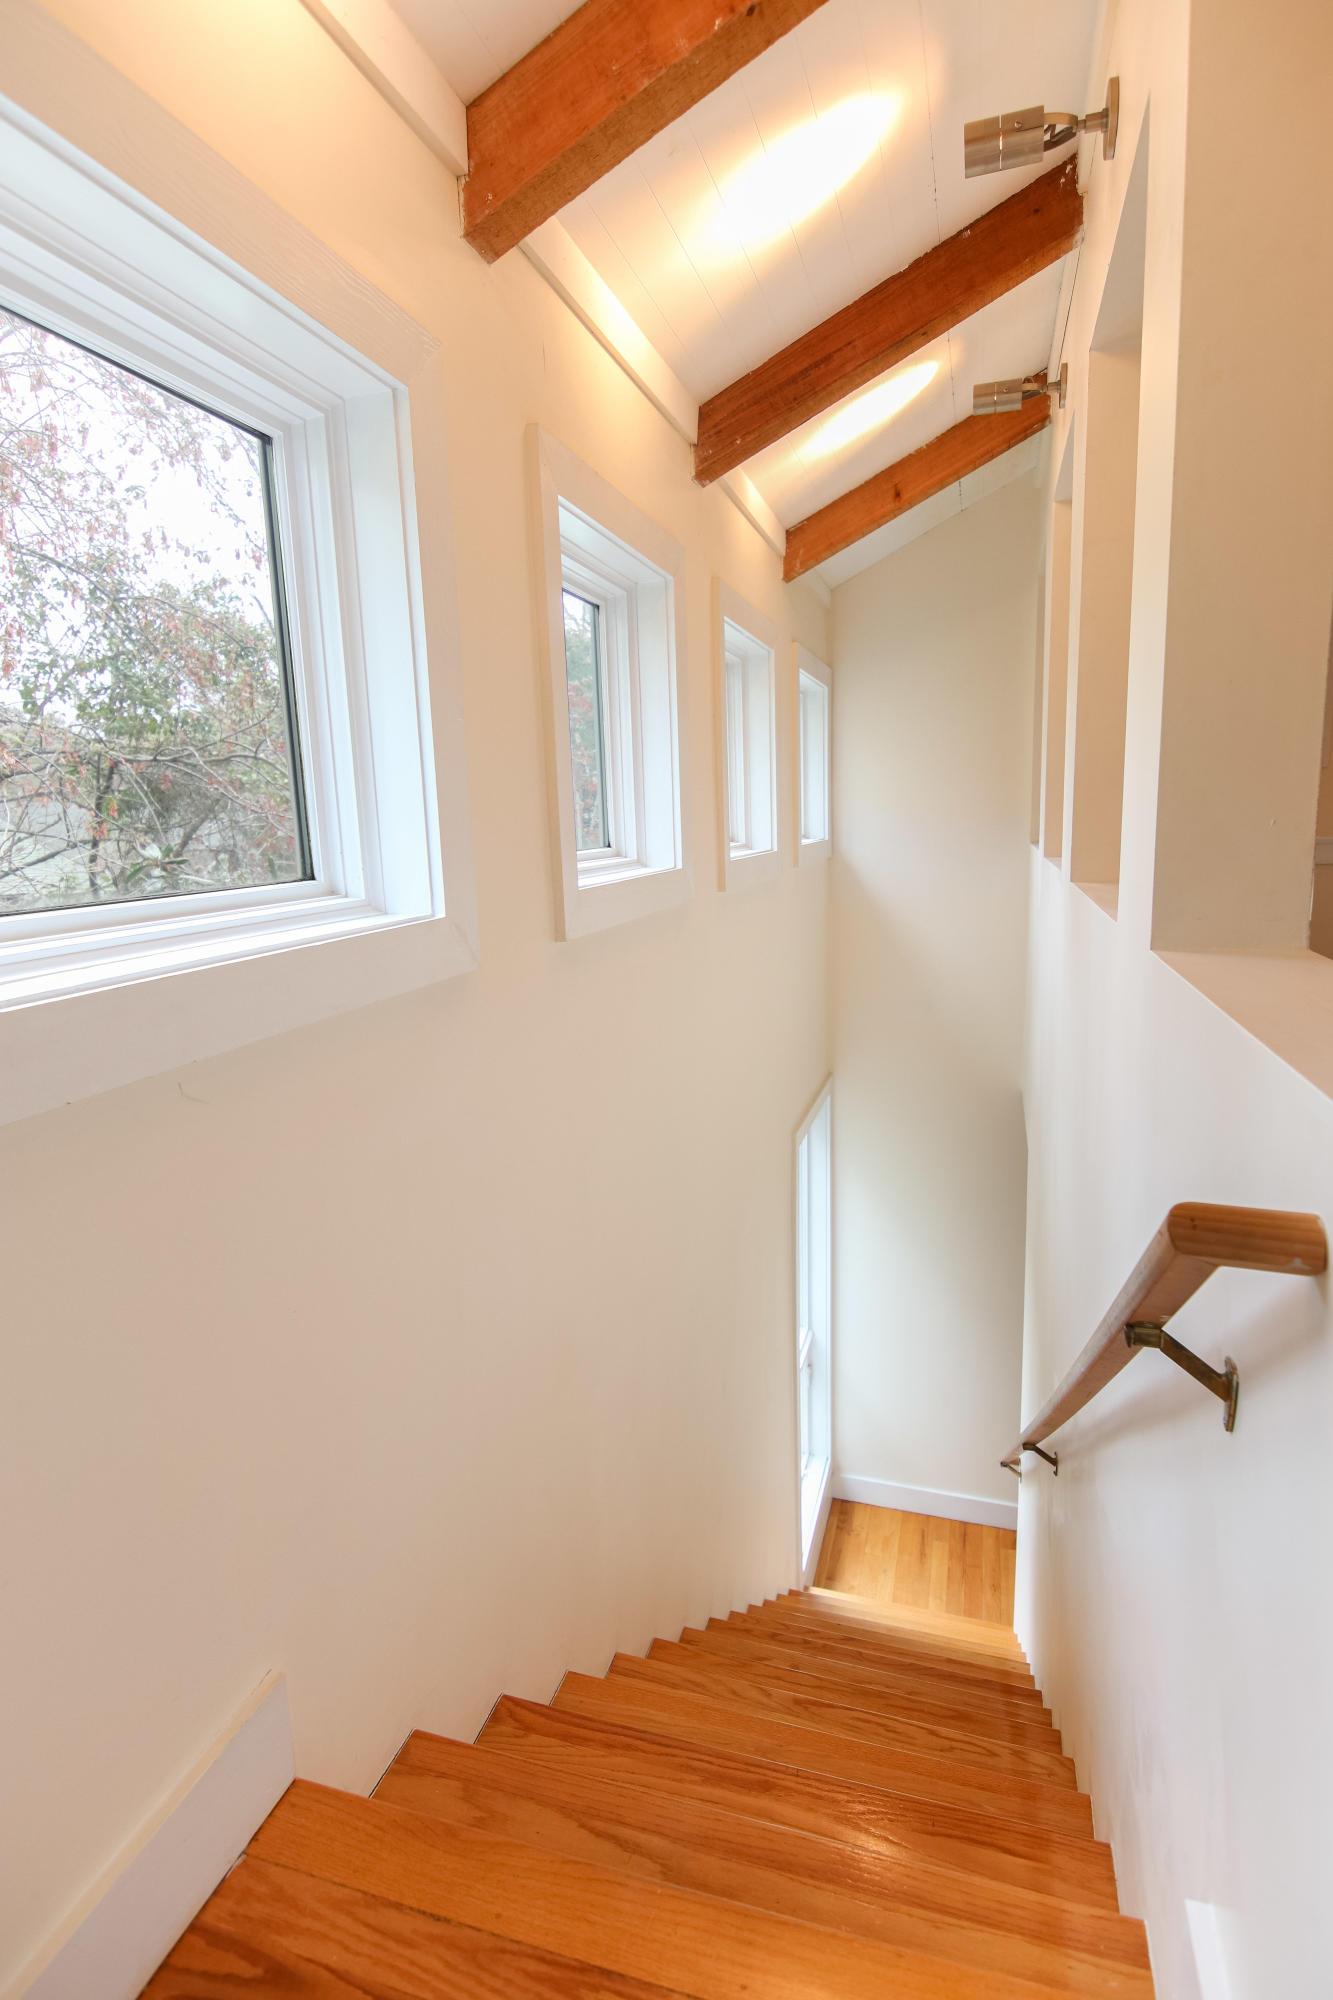 Riverland Terrace Homes For Sale - 2217 Ramsay, Charleston, SC - 1